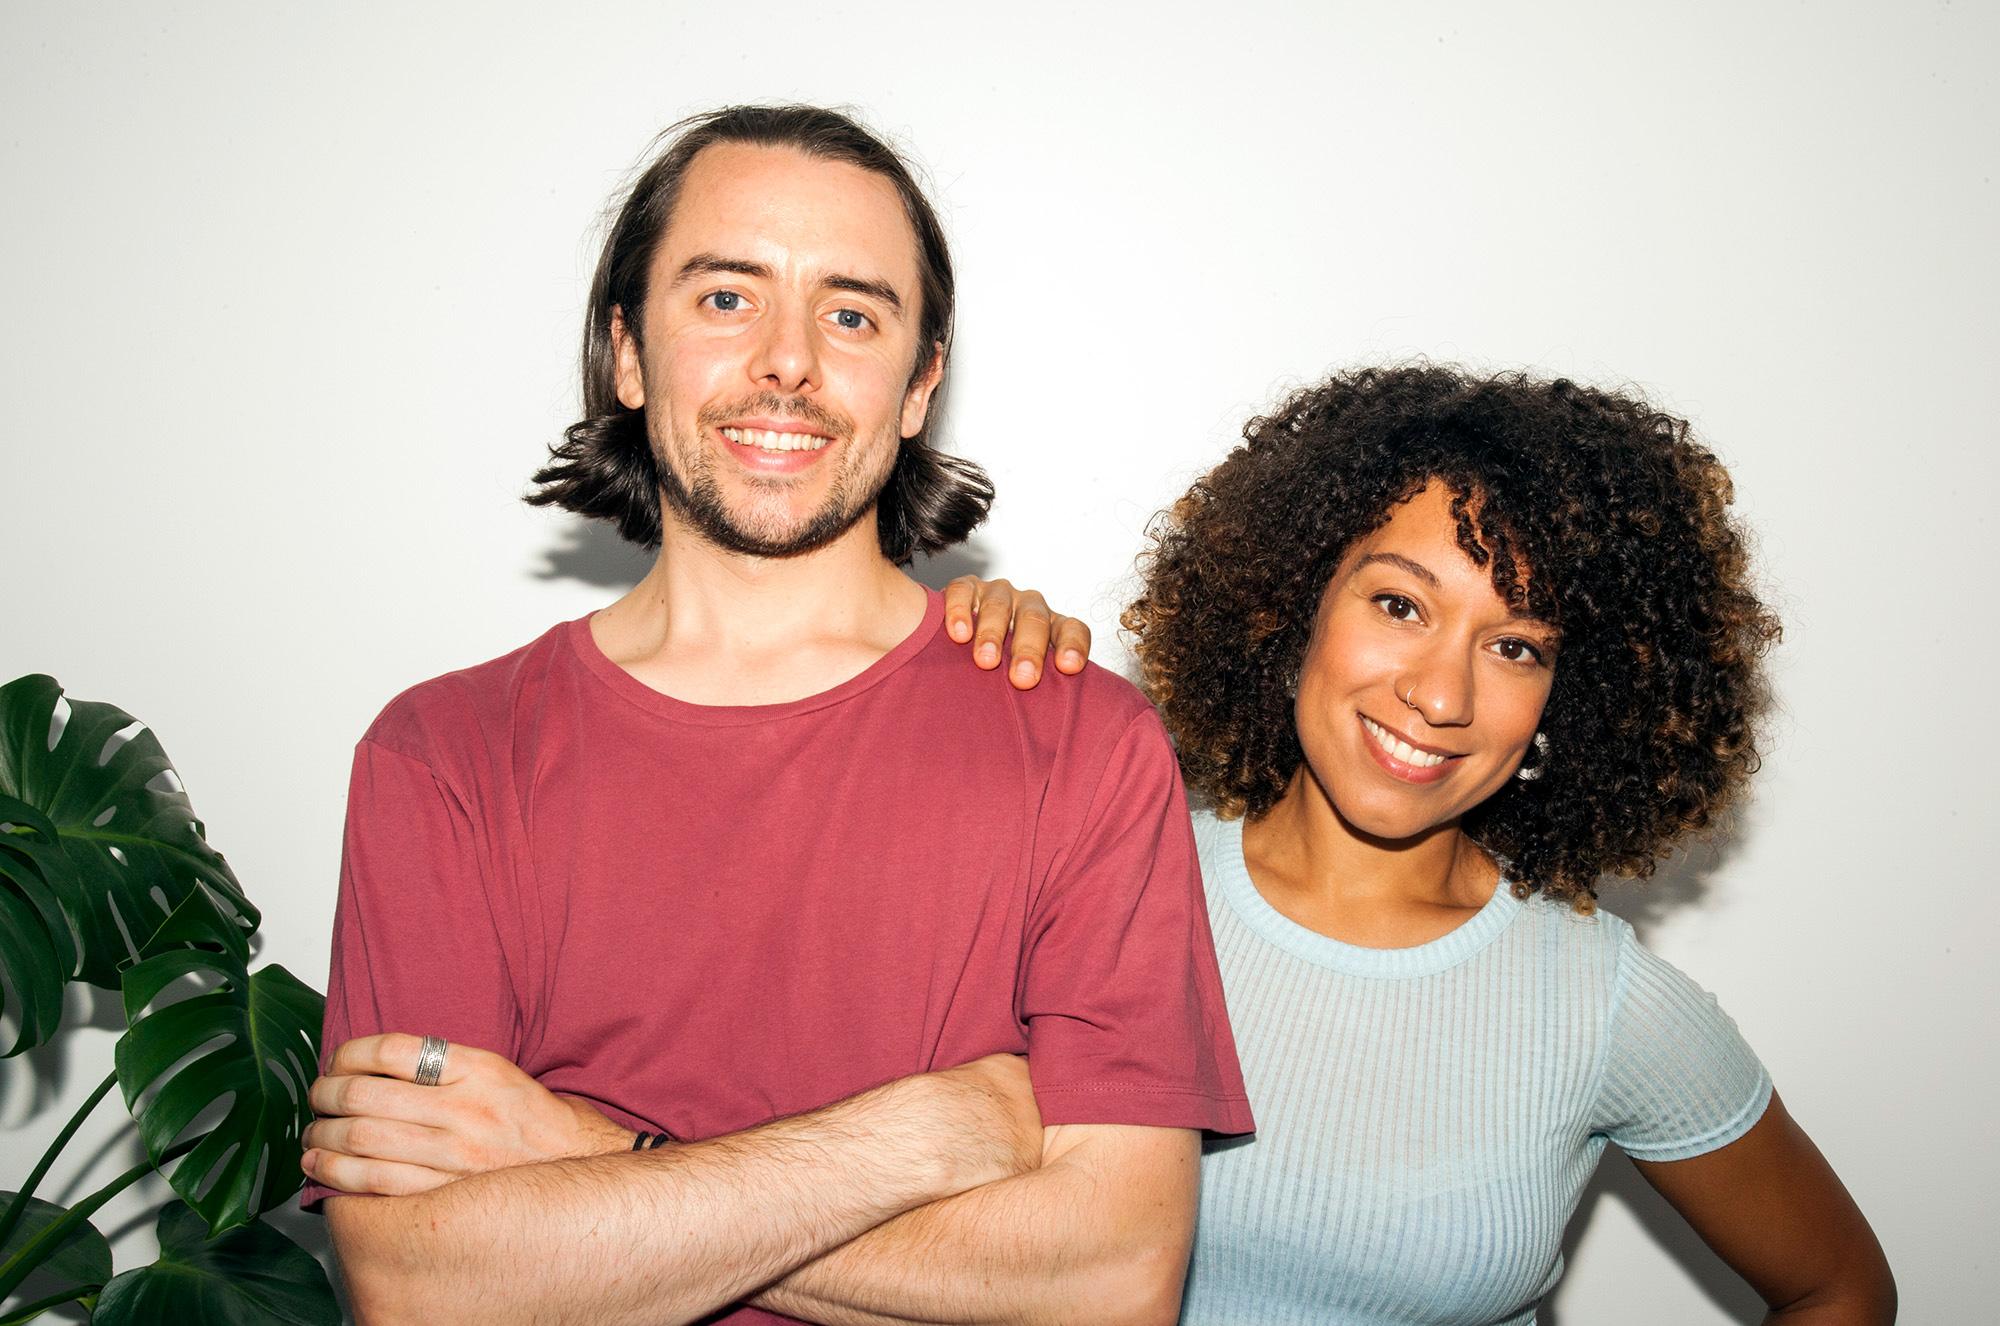 Ben Pook and Roxy Pope, founders of online vegan recipe channel  So Vegan